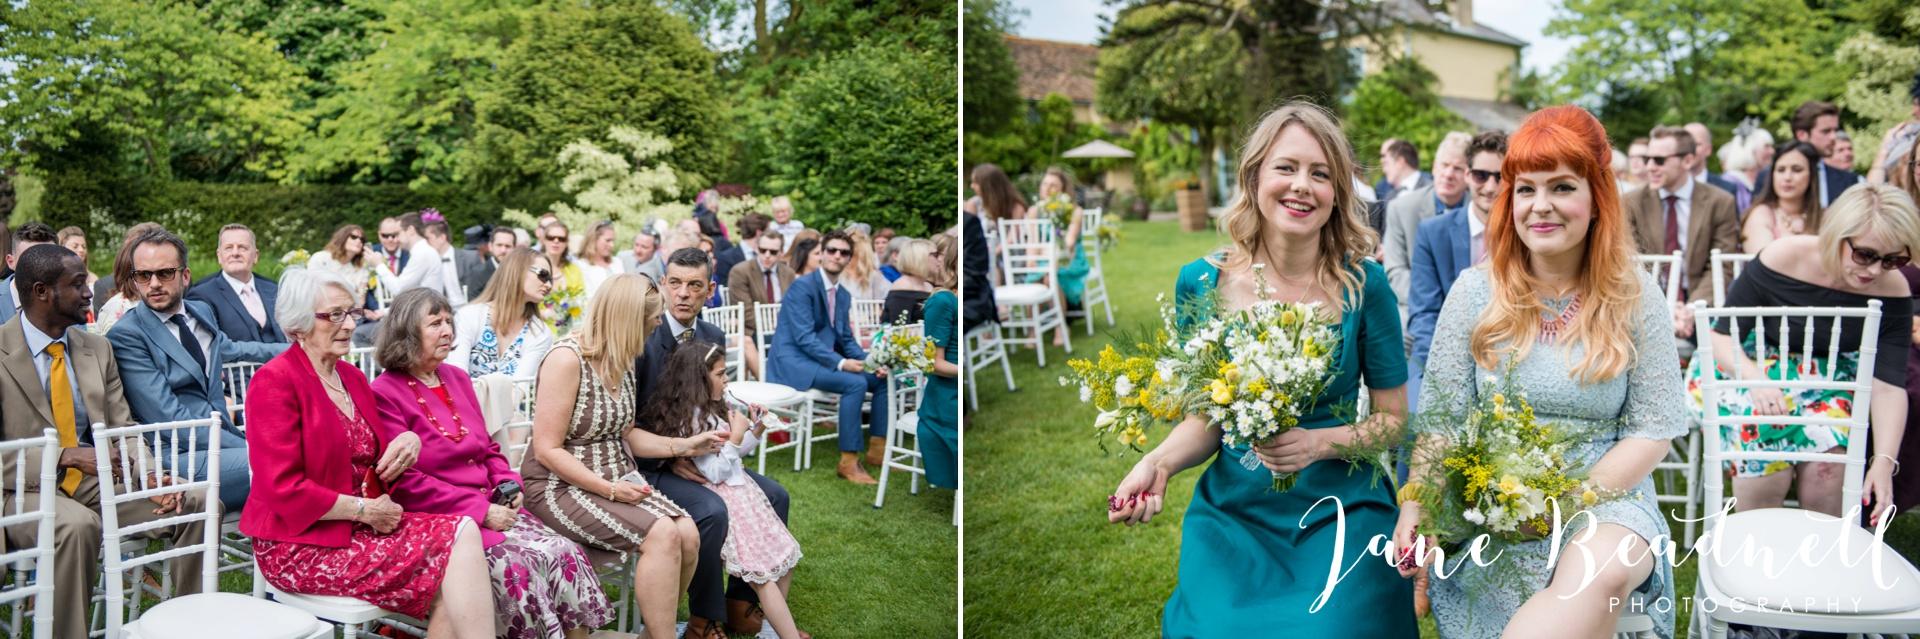 South Farm Wedding photography Hertfordshire by Jane Beadnell Photography fine art wedding photographer_0077